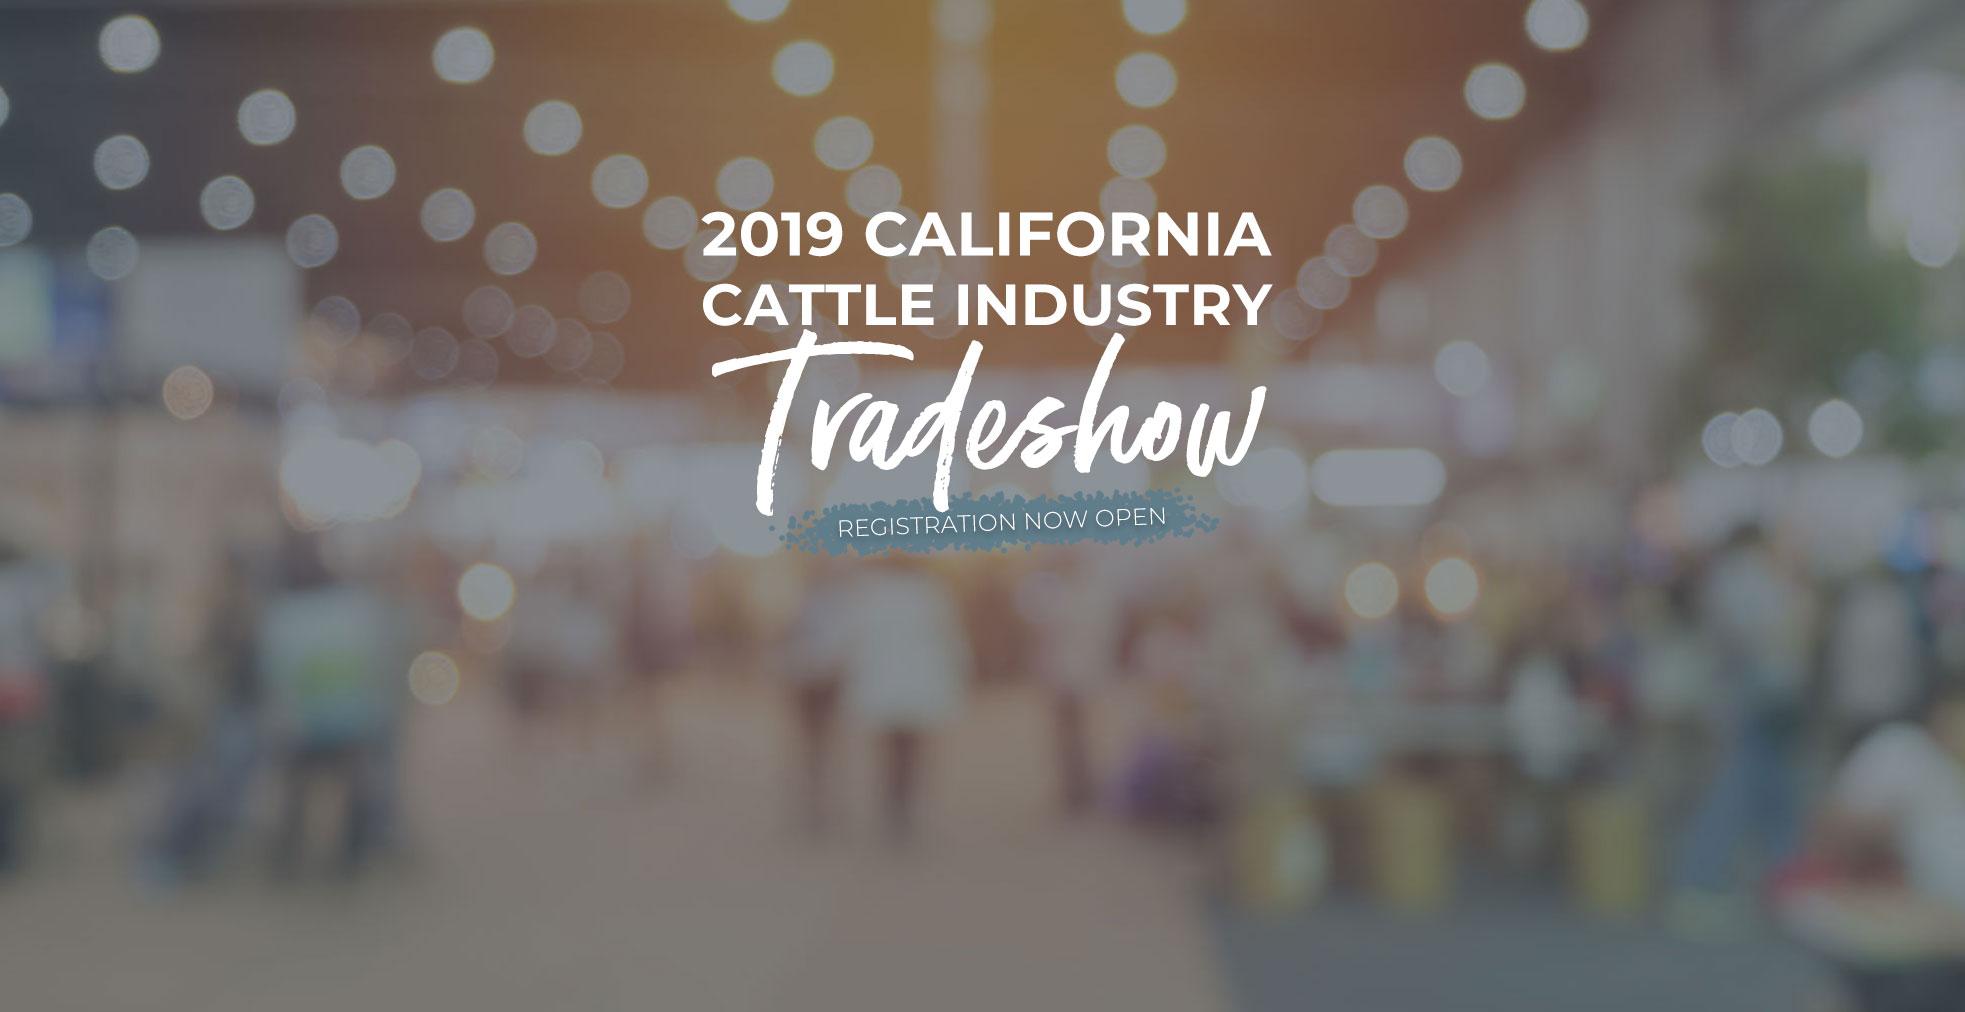 2018 California Cattle Industry Tradeshow registration open